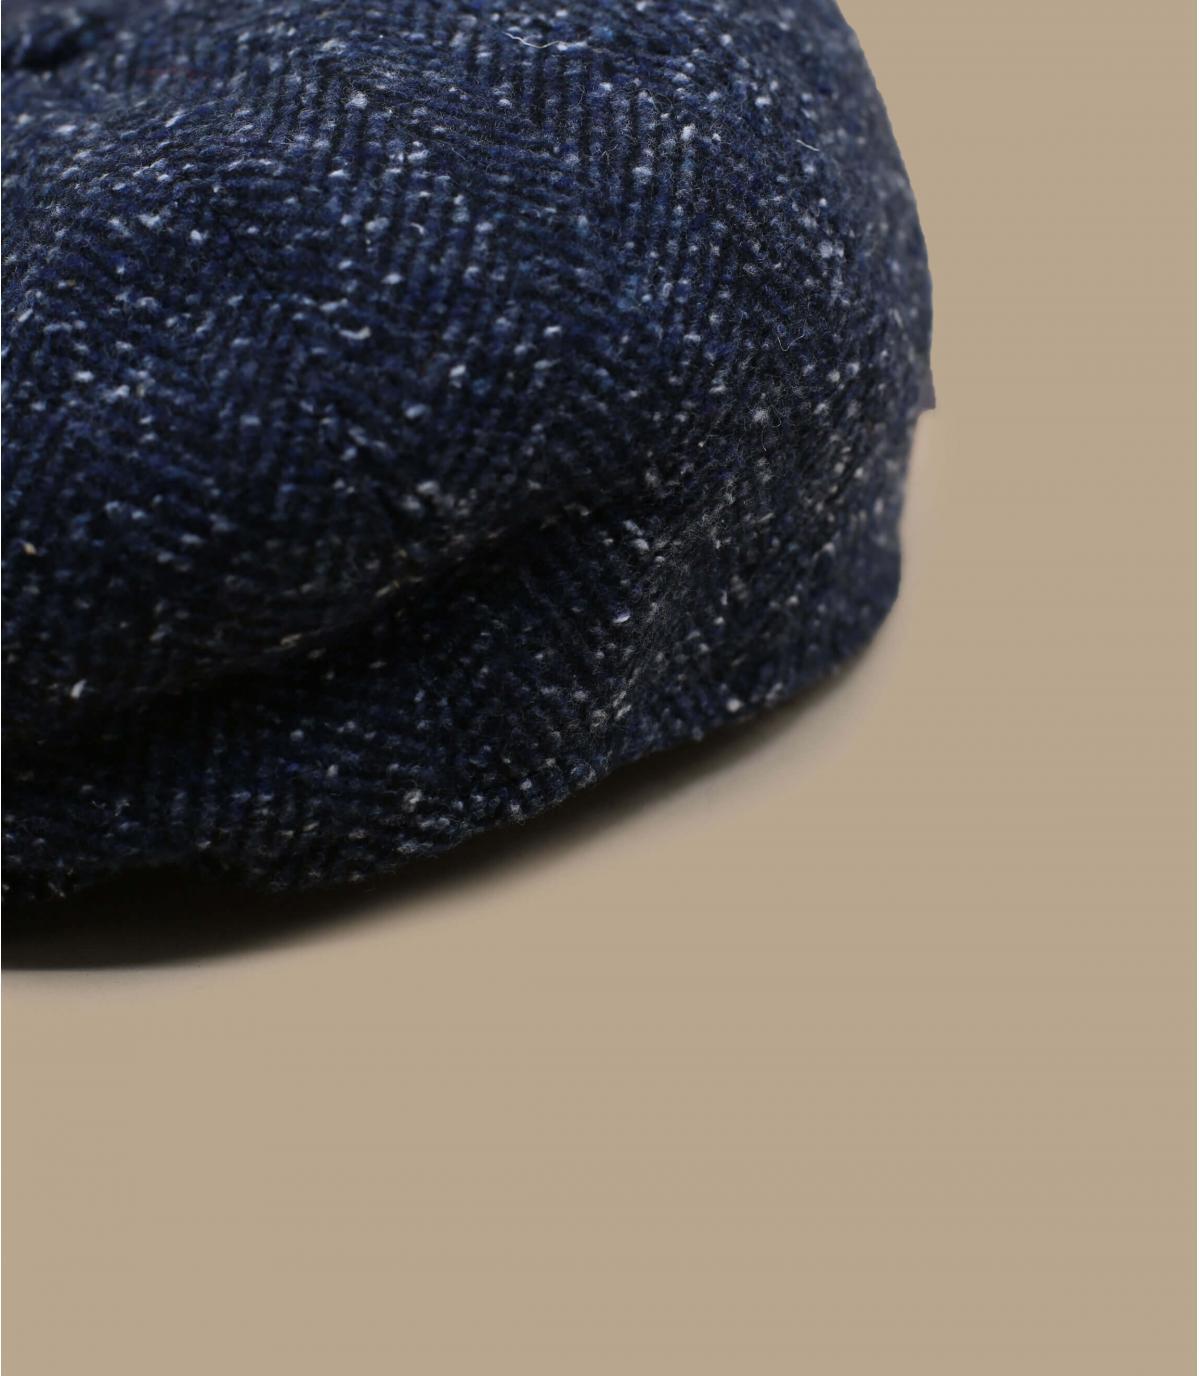 Details Staffy Atollo blau - Abbildung 2